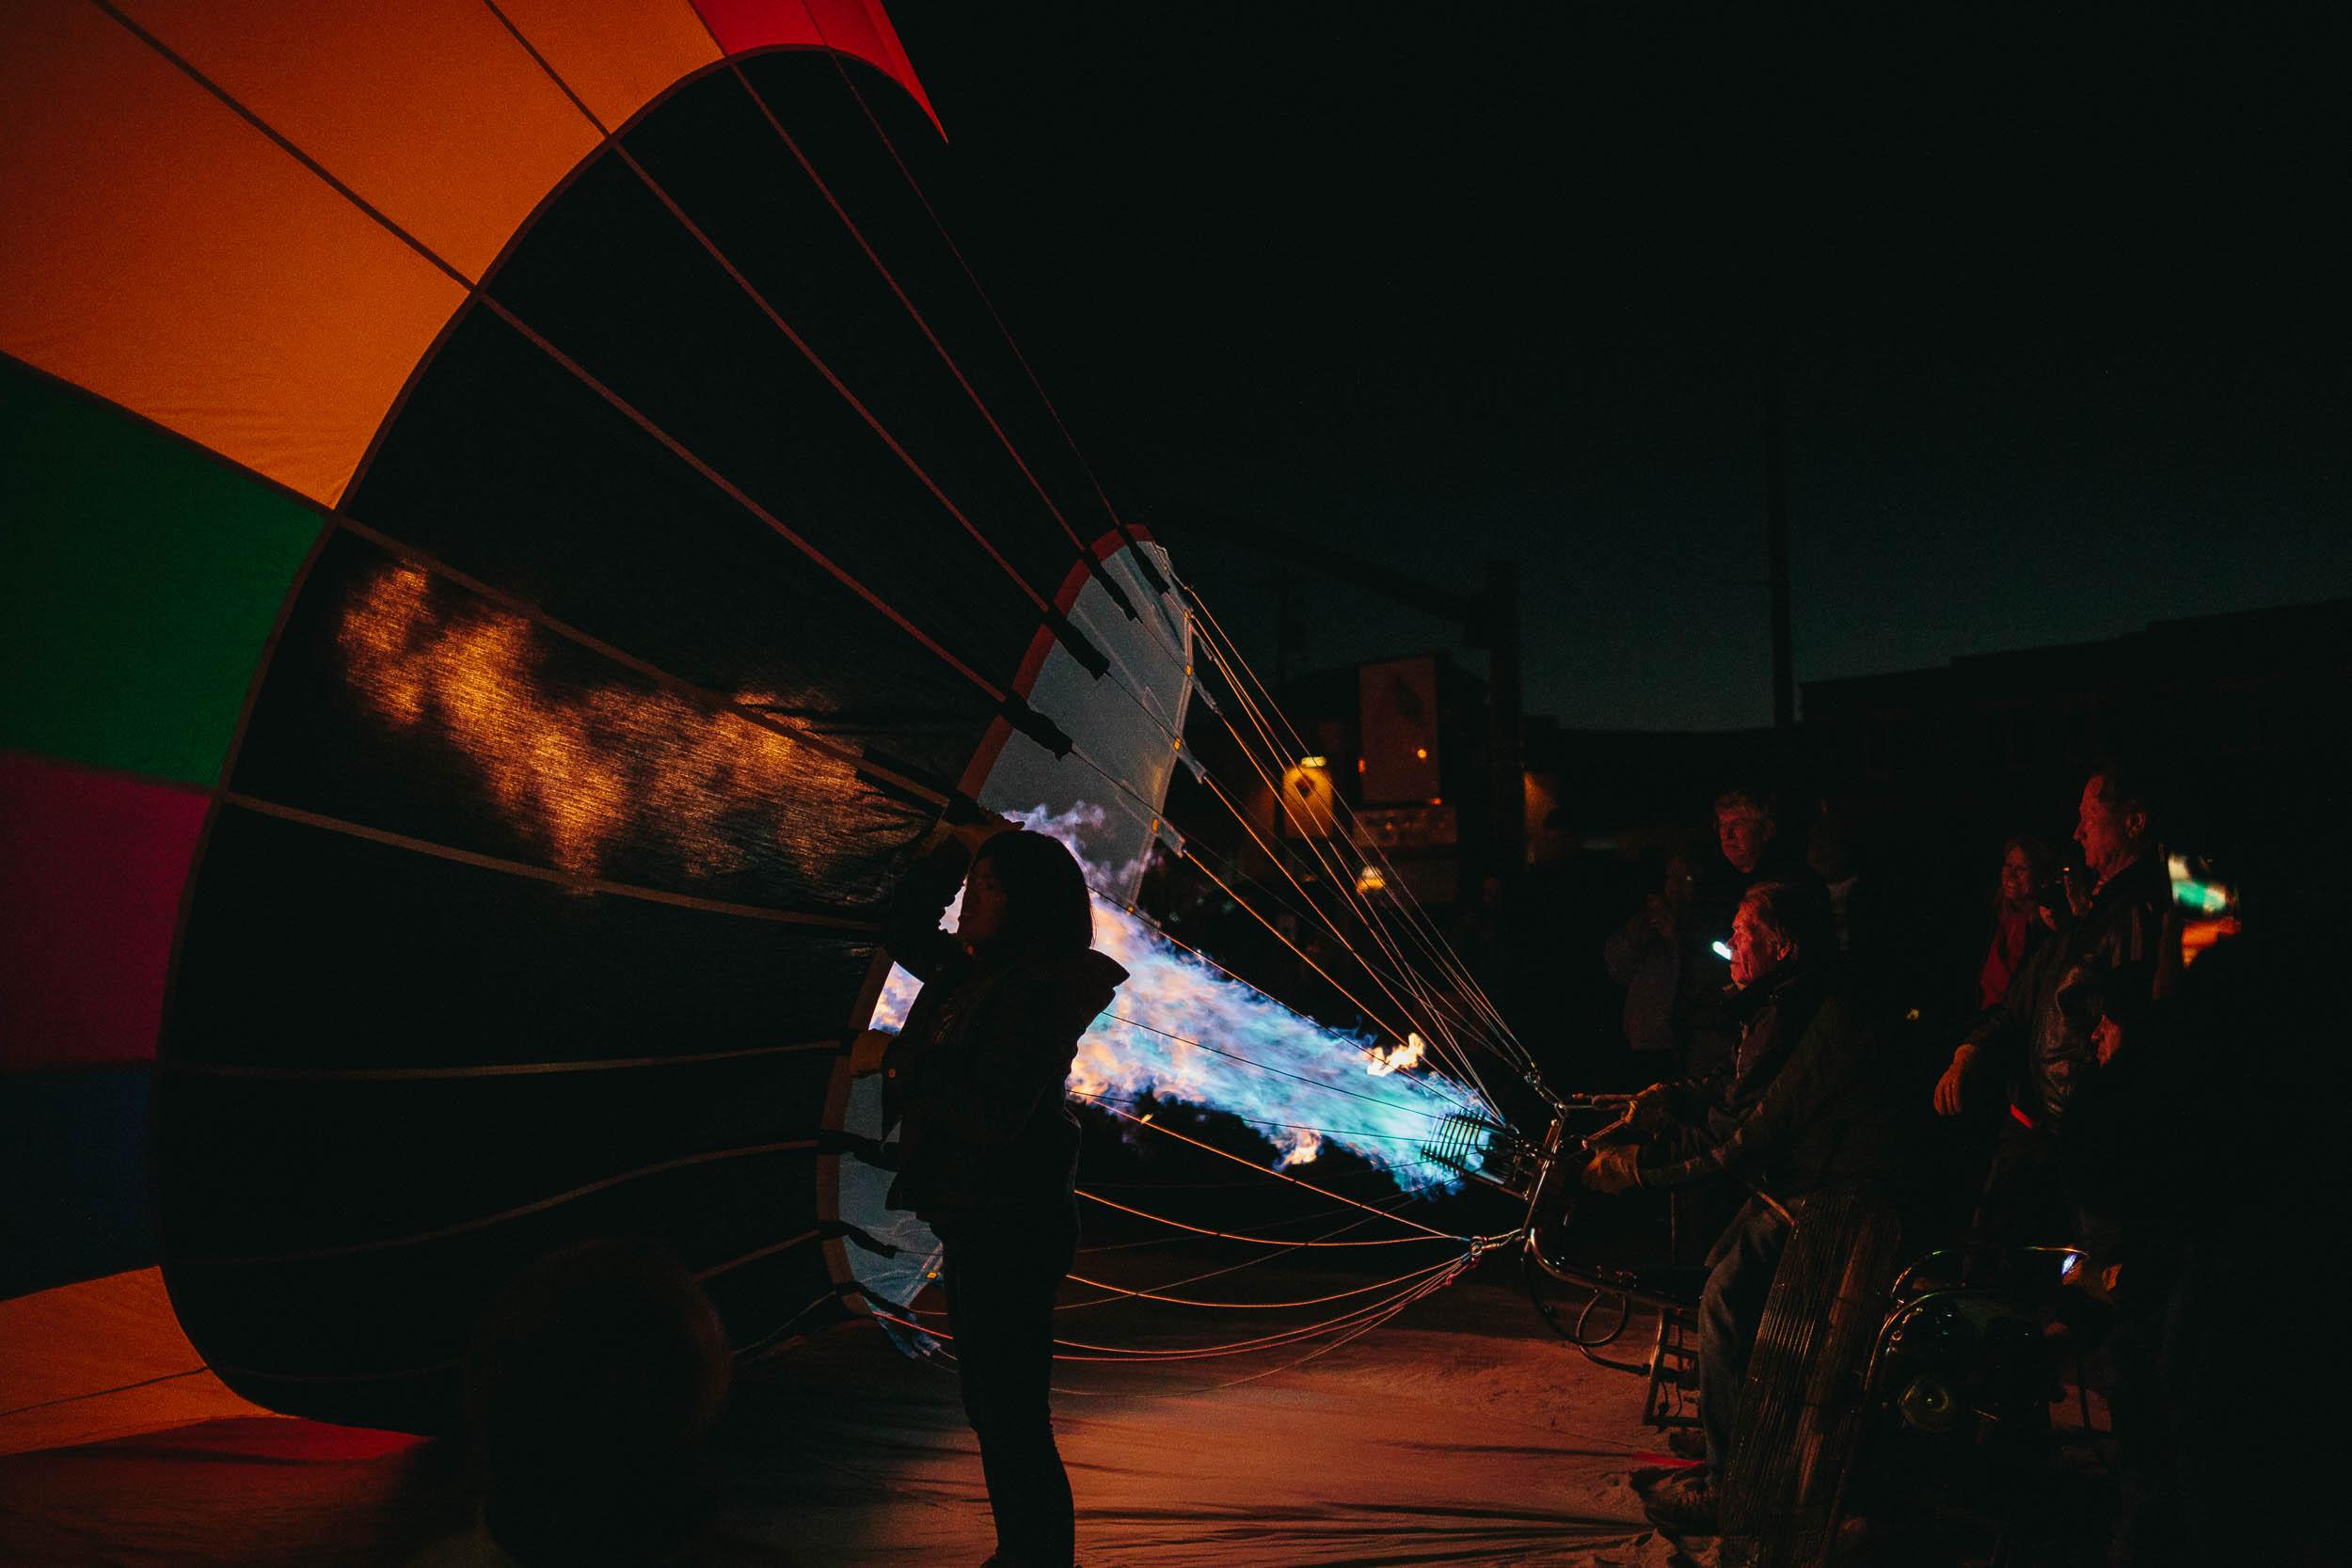 Kyle-Sheppard-Kanab-Balloon-Festival-45.jpg